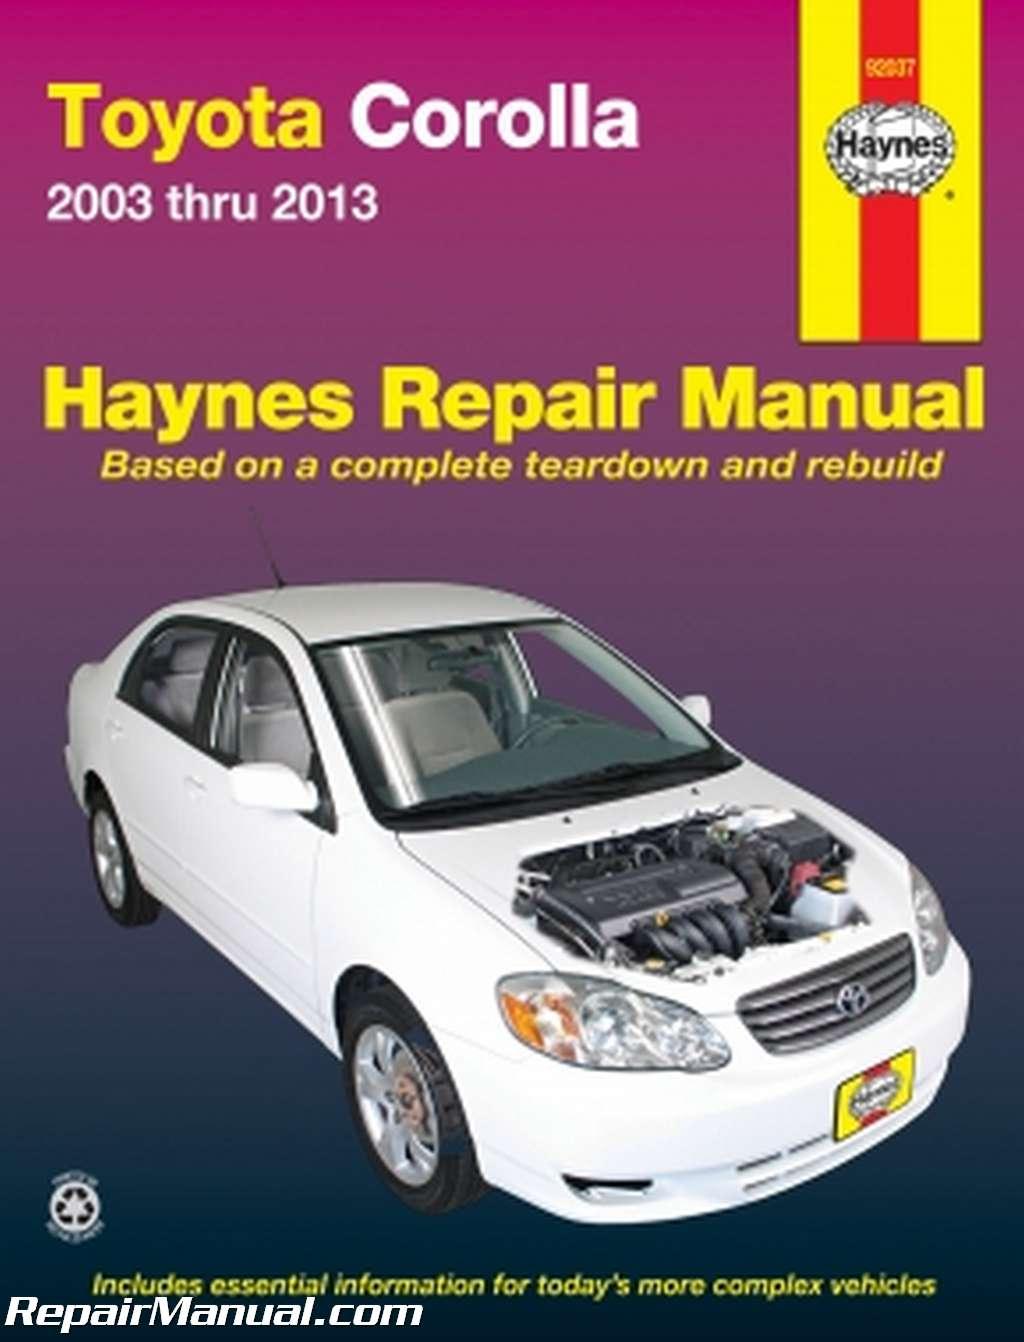 Haynes Toyota Corolla 2003